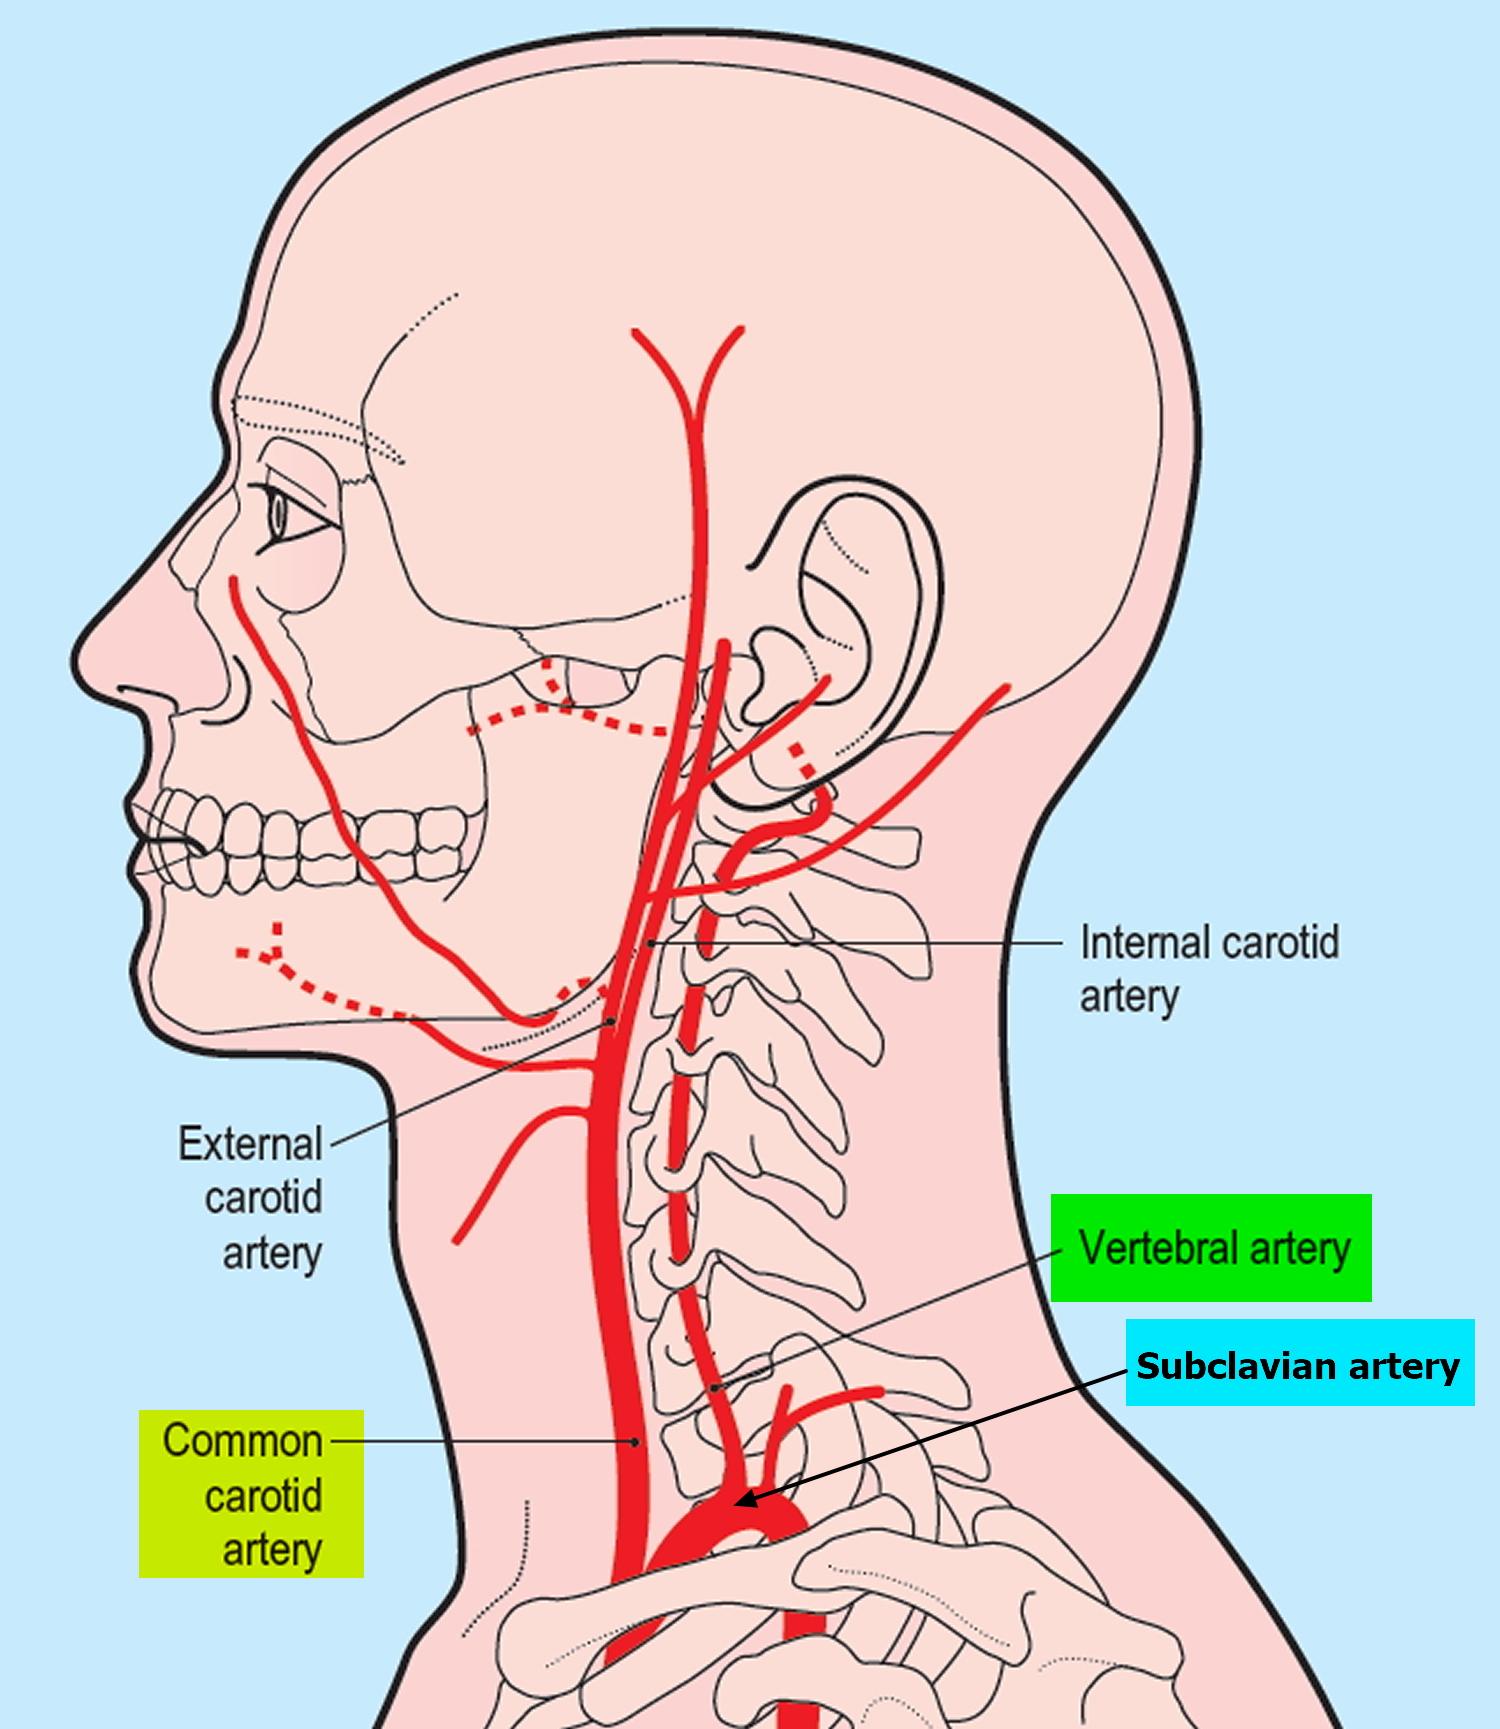 hight resolution of vertebral artery segments